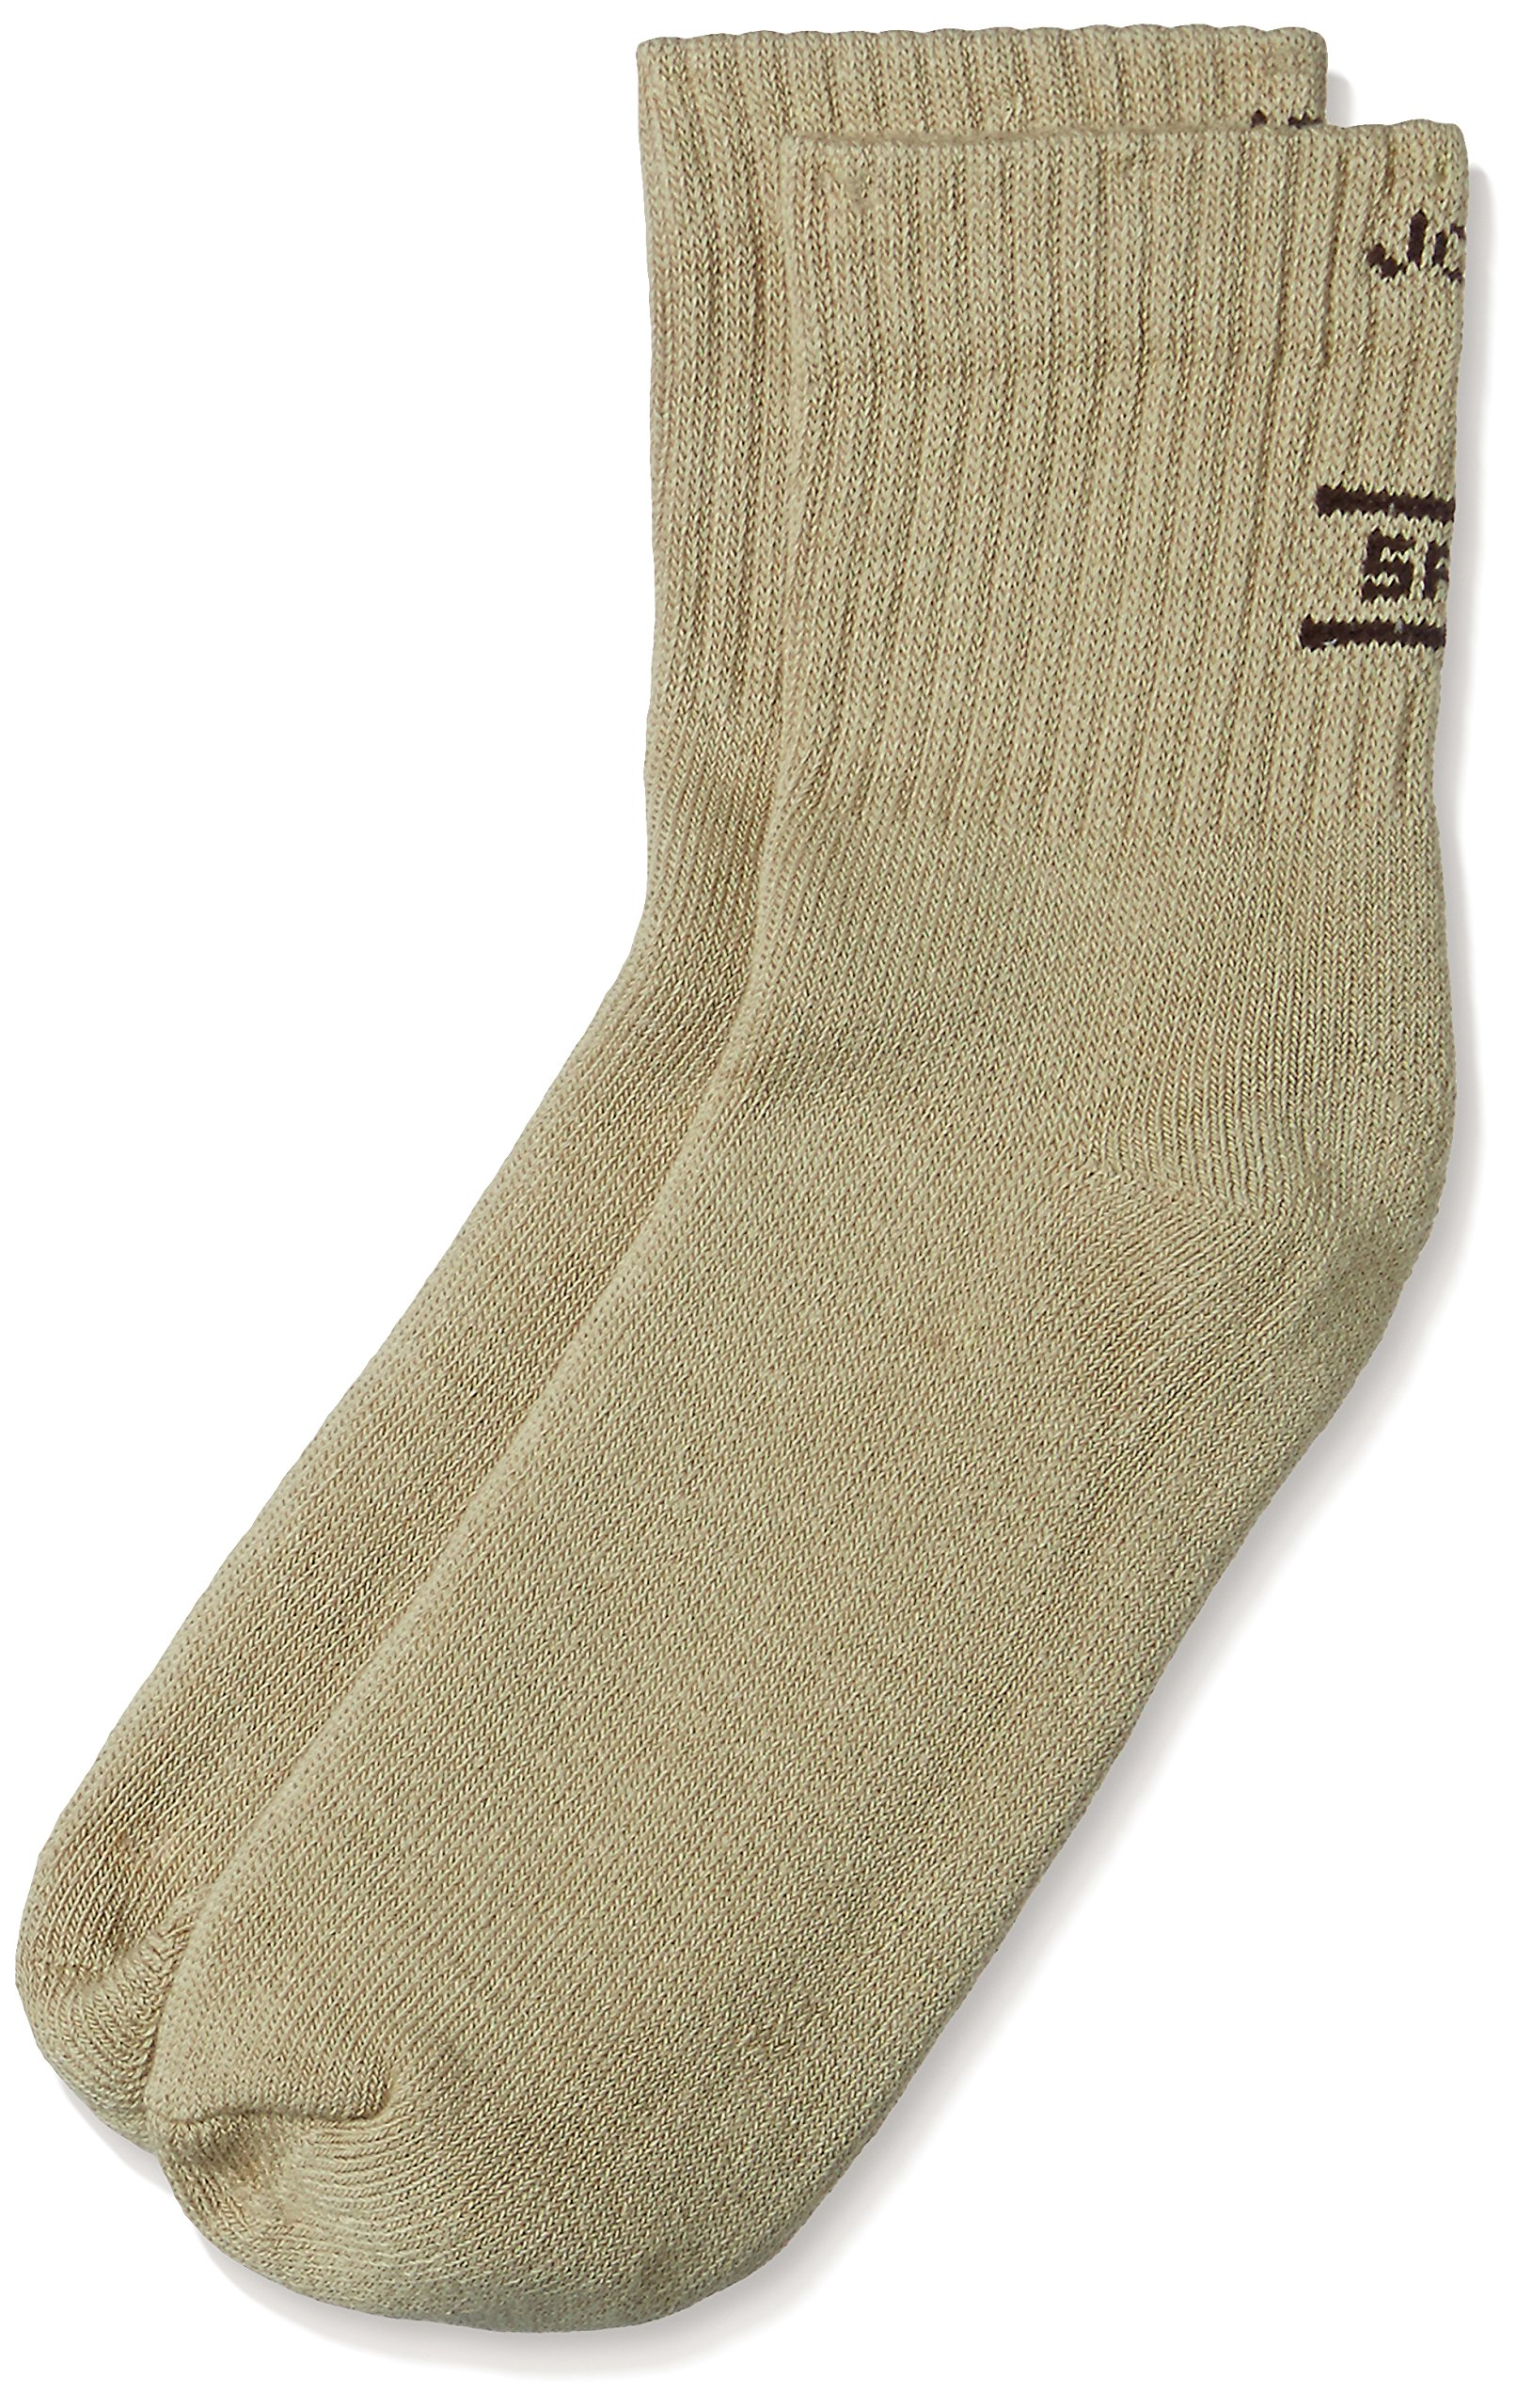 Jockey Men's Cotton Socks product image